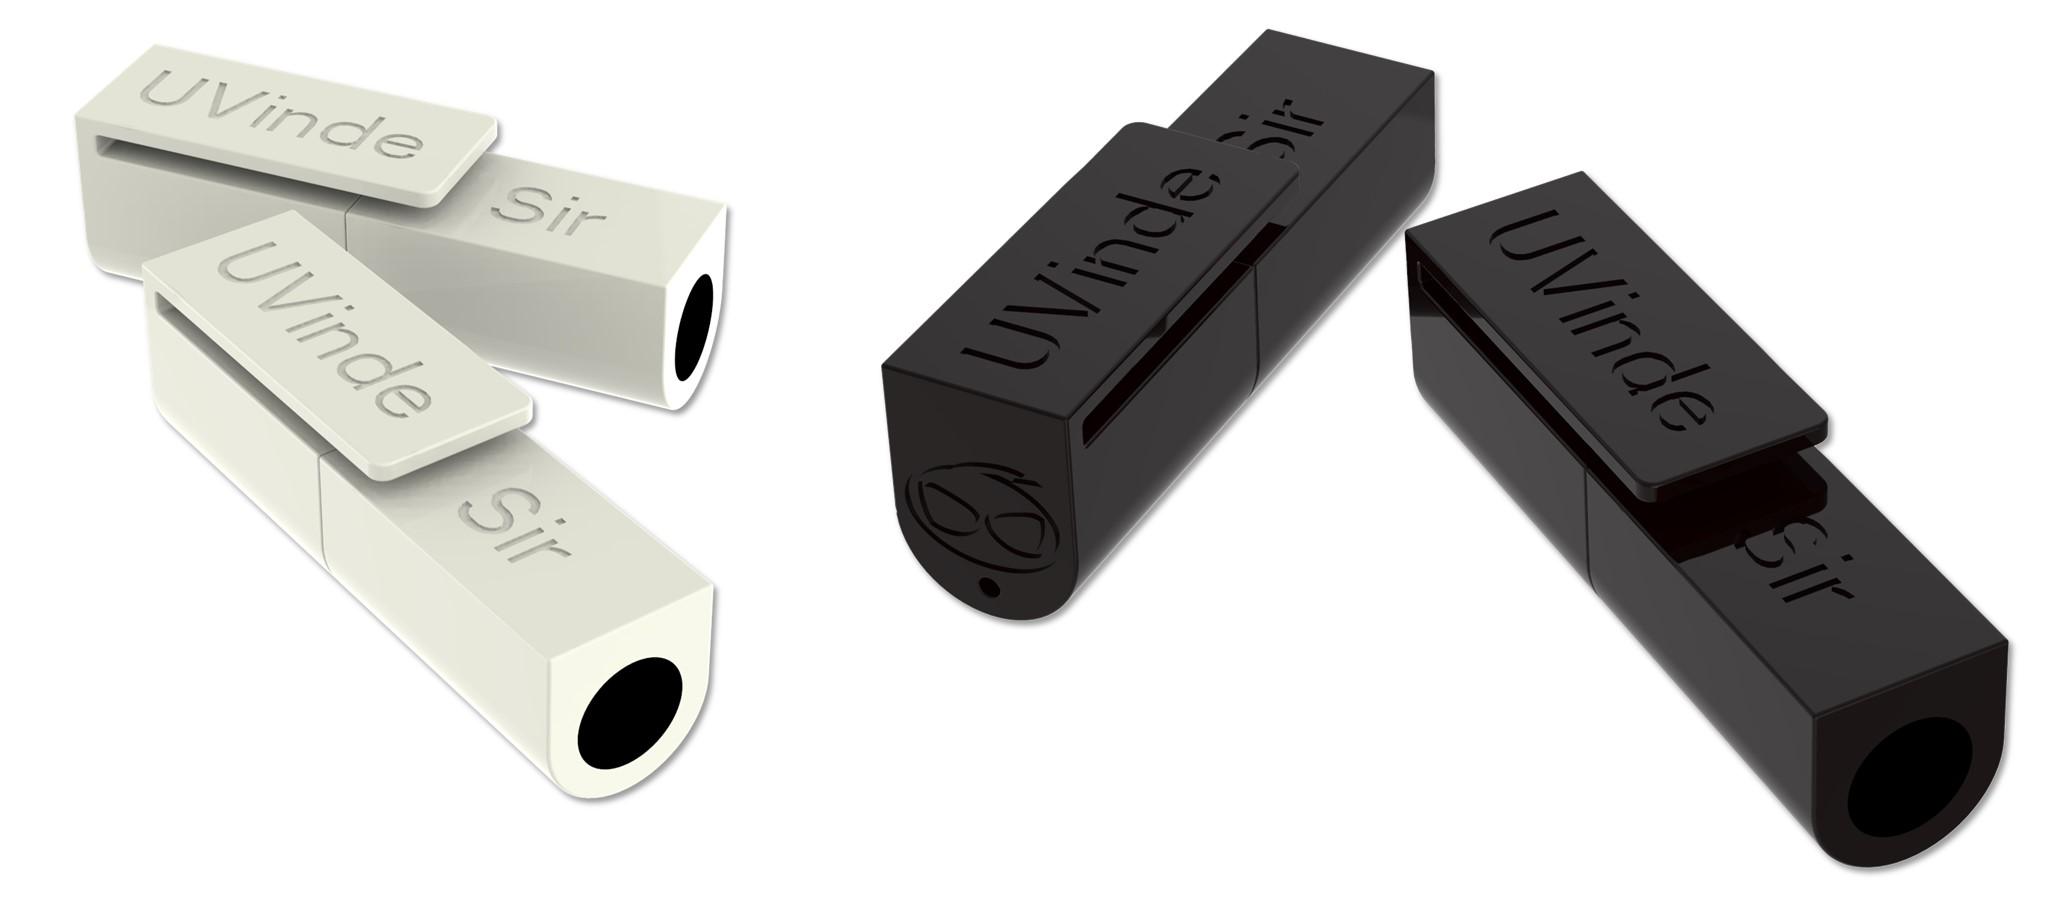 UVindeSir-5